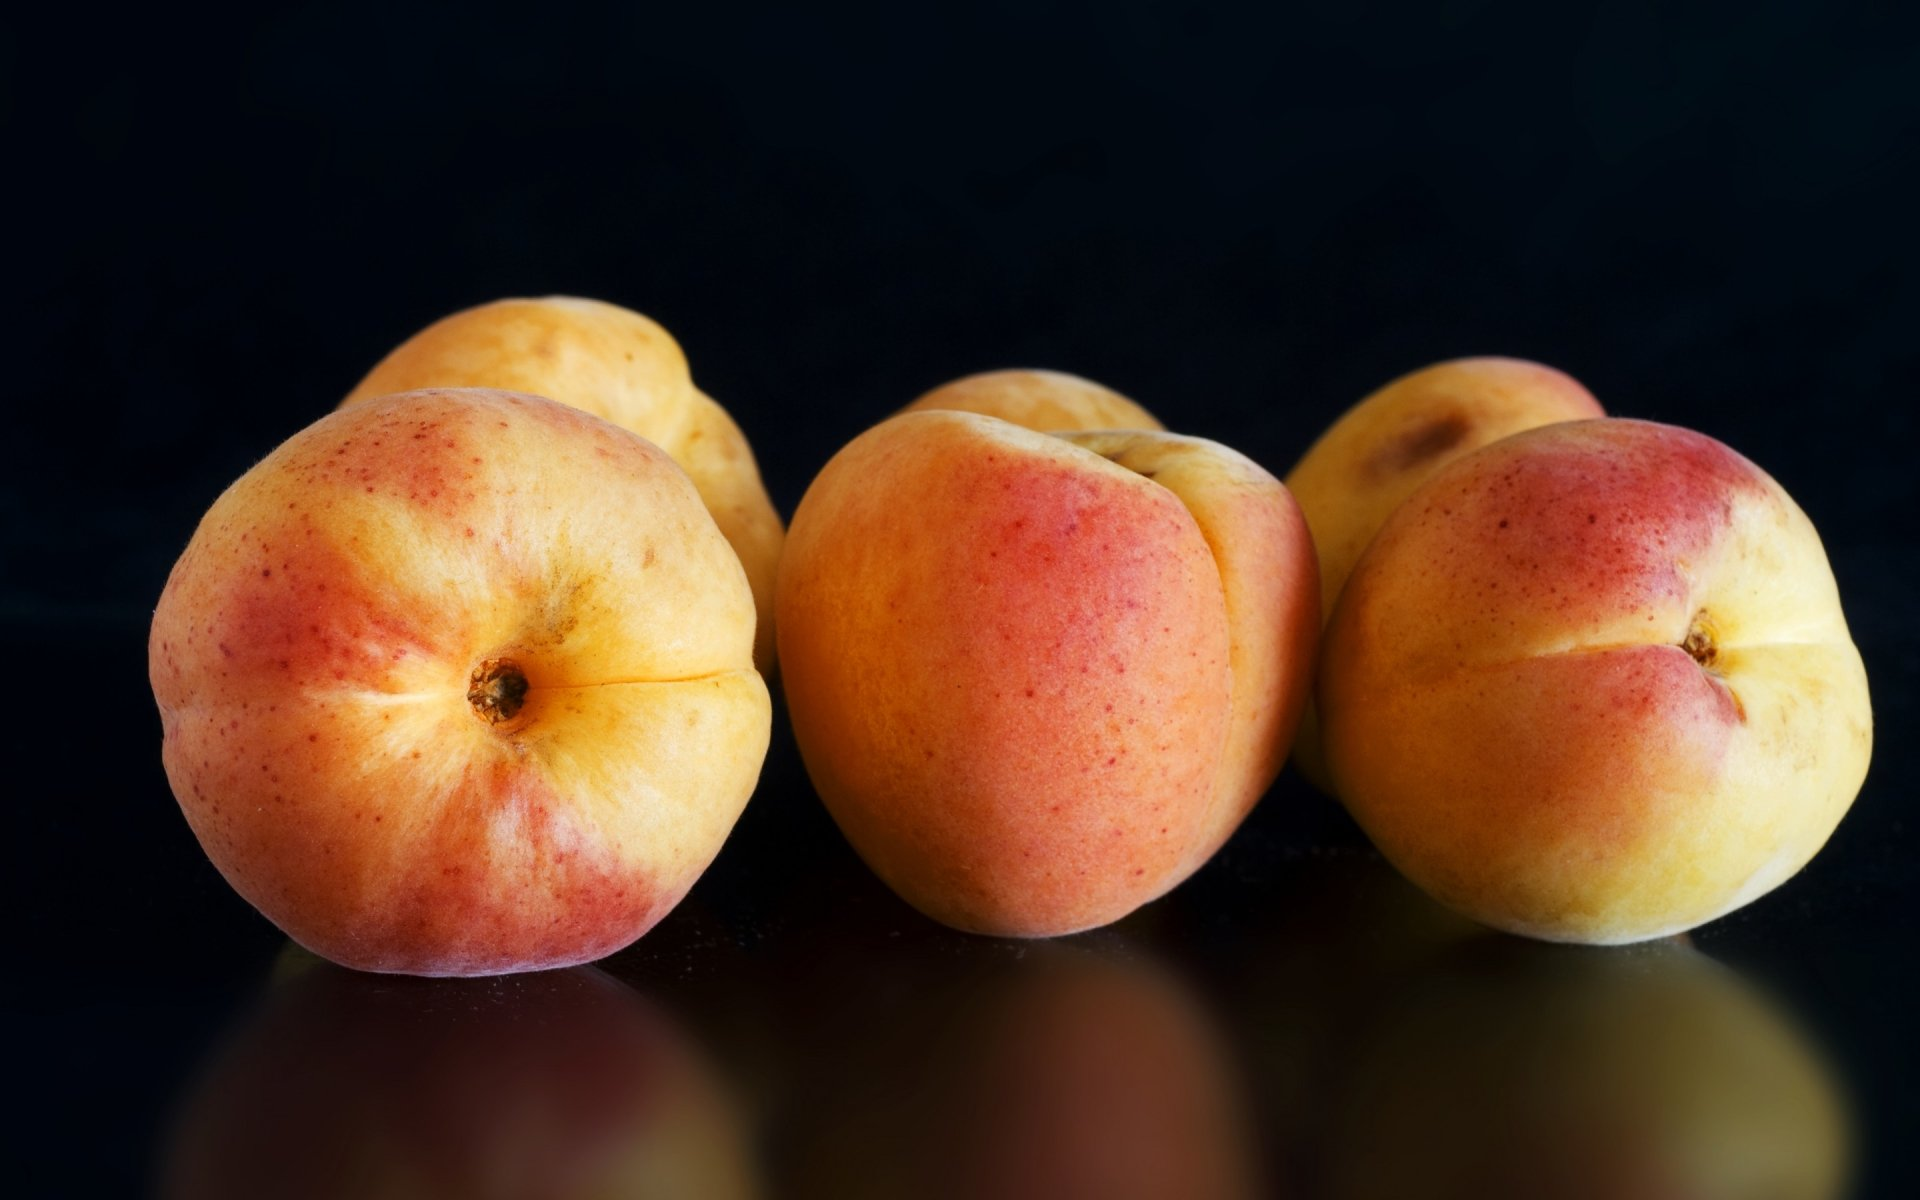 Food - Peach  Wallpaper